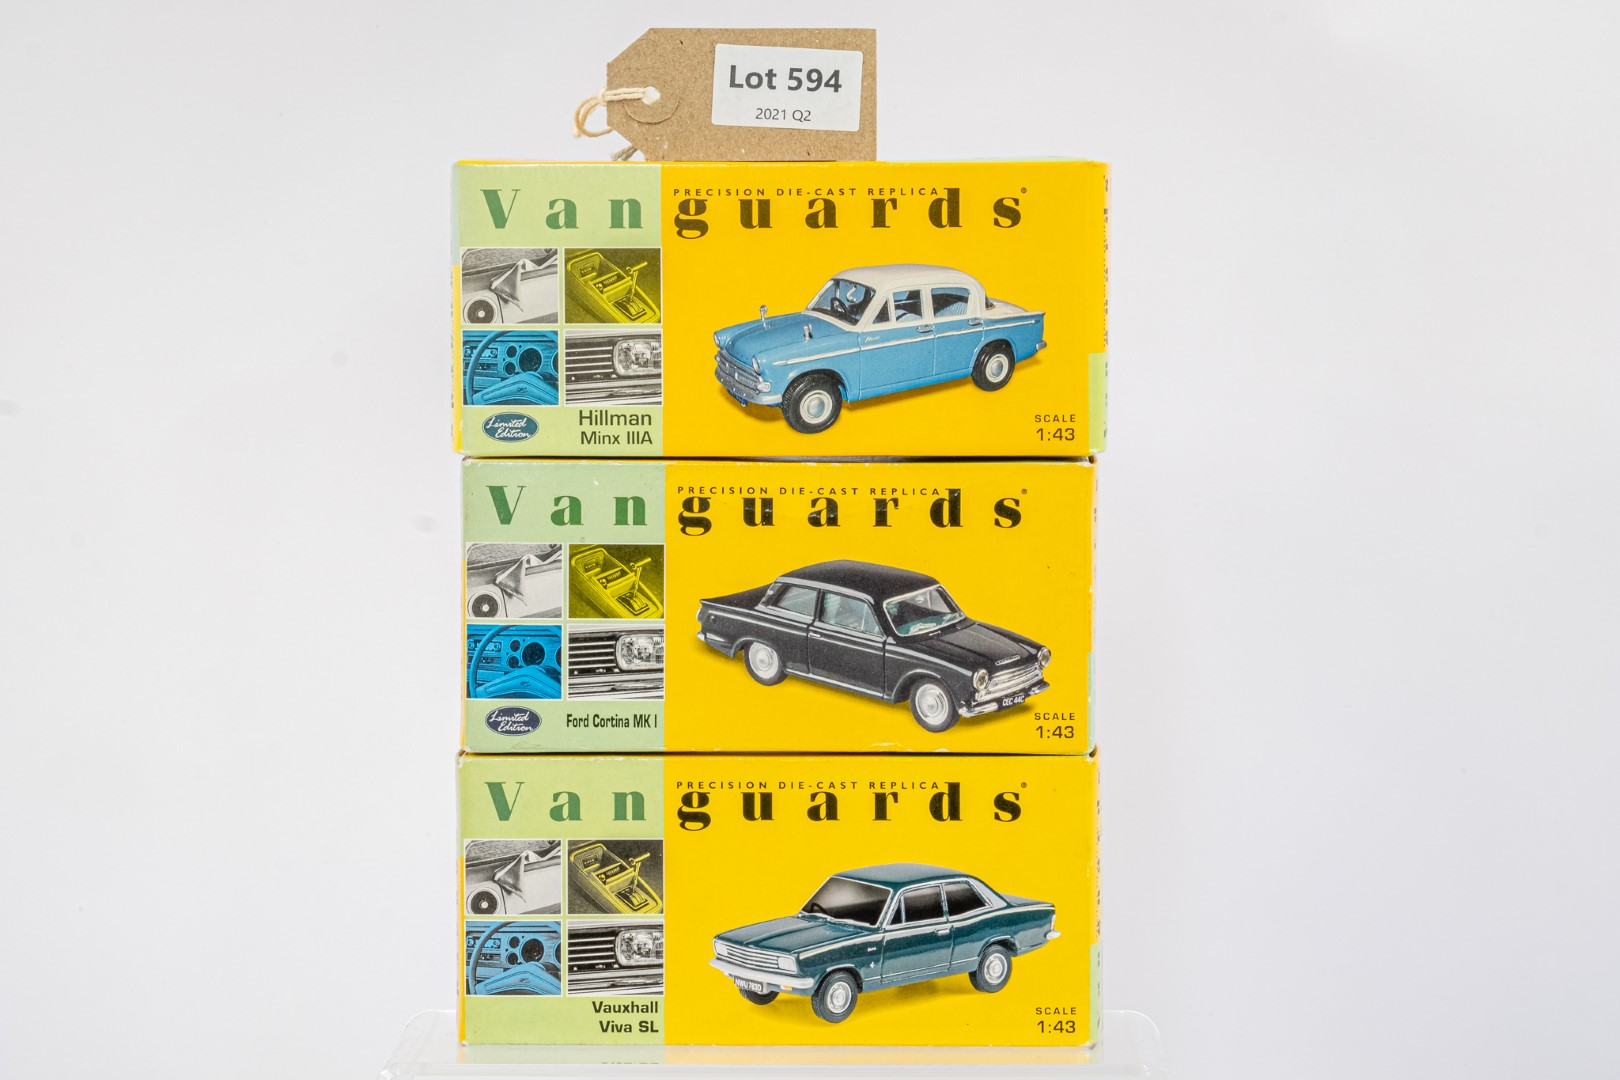 Vanguards Vauxhall Viva SL / Ford Cortina MK I / Hillman Minx IIIA -